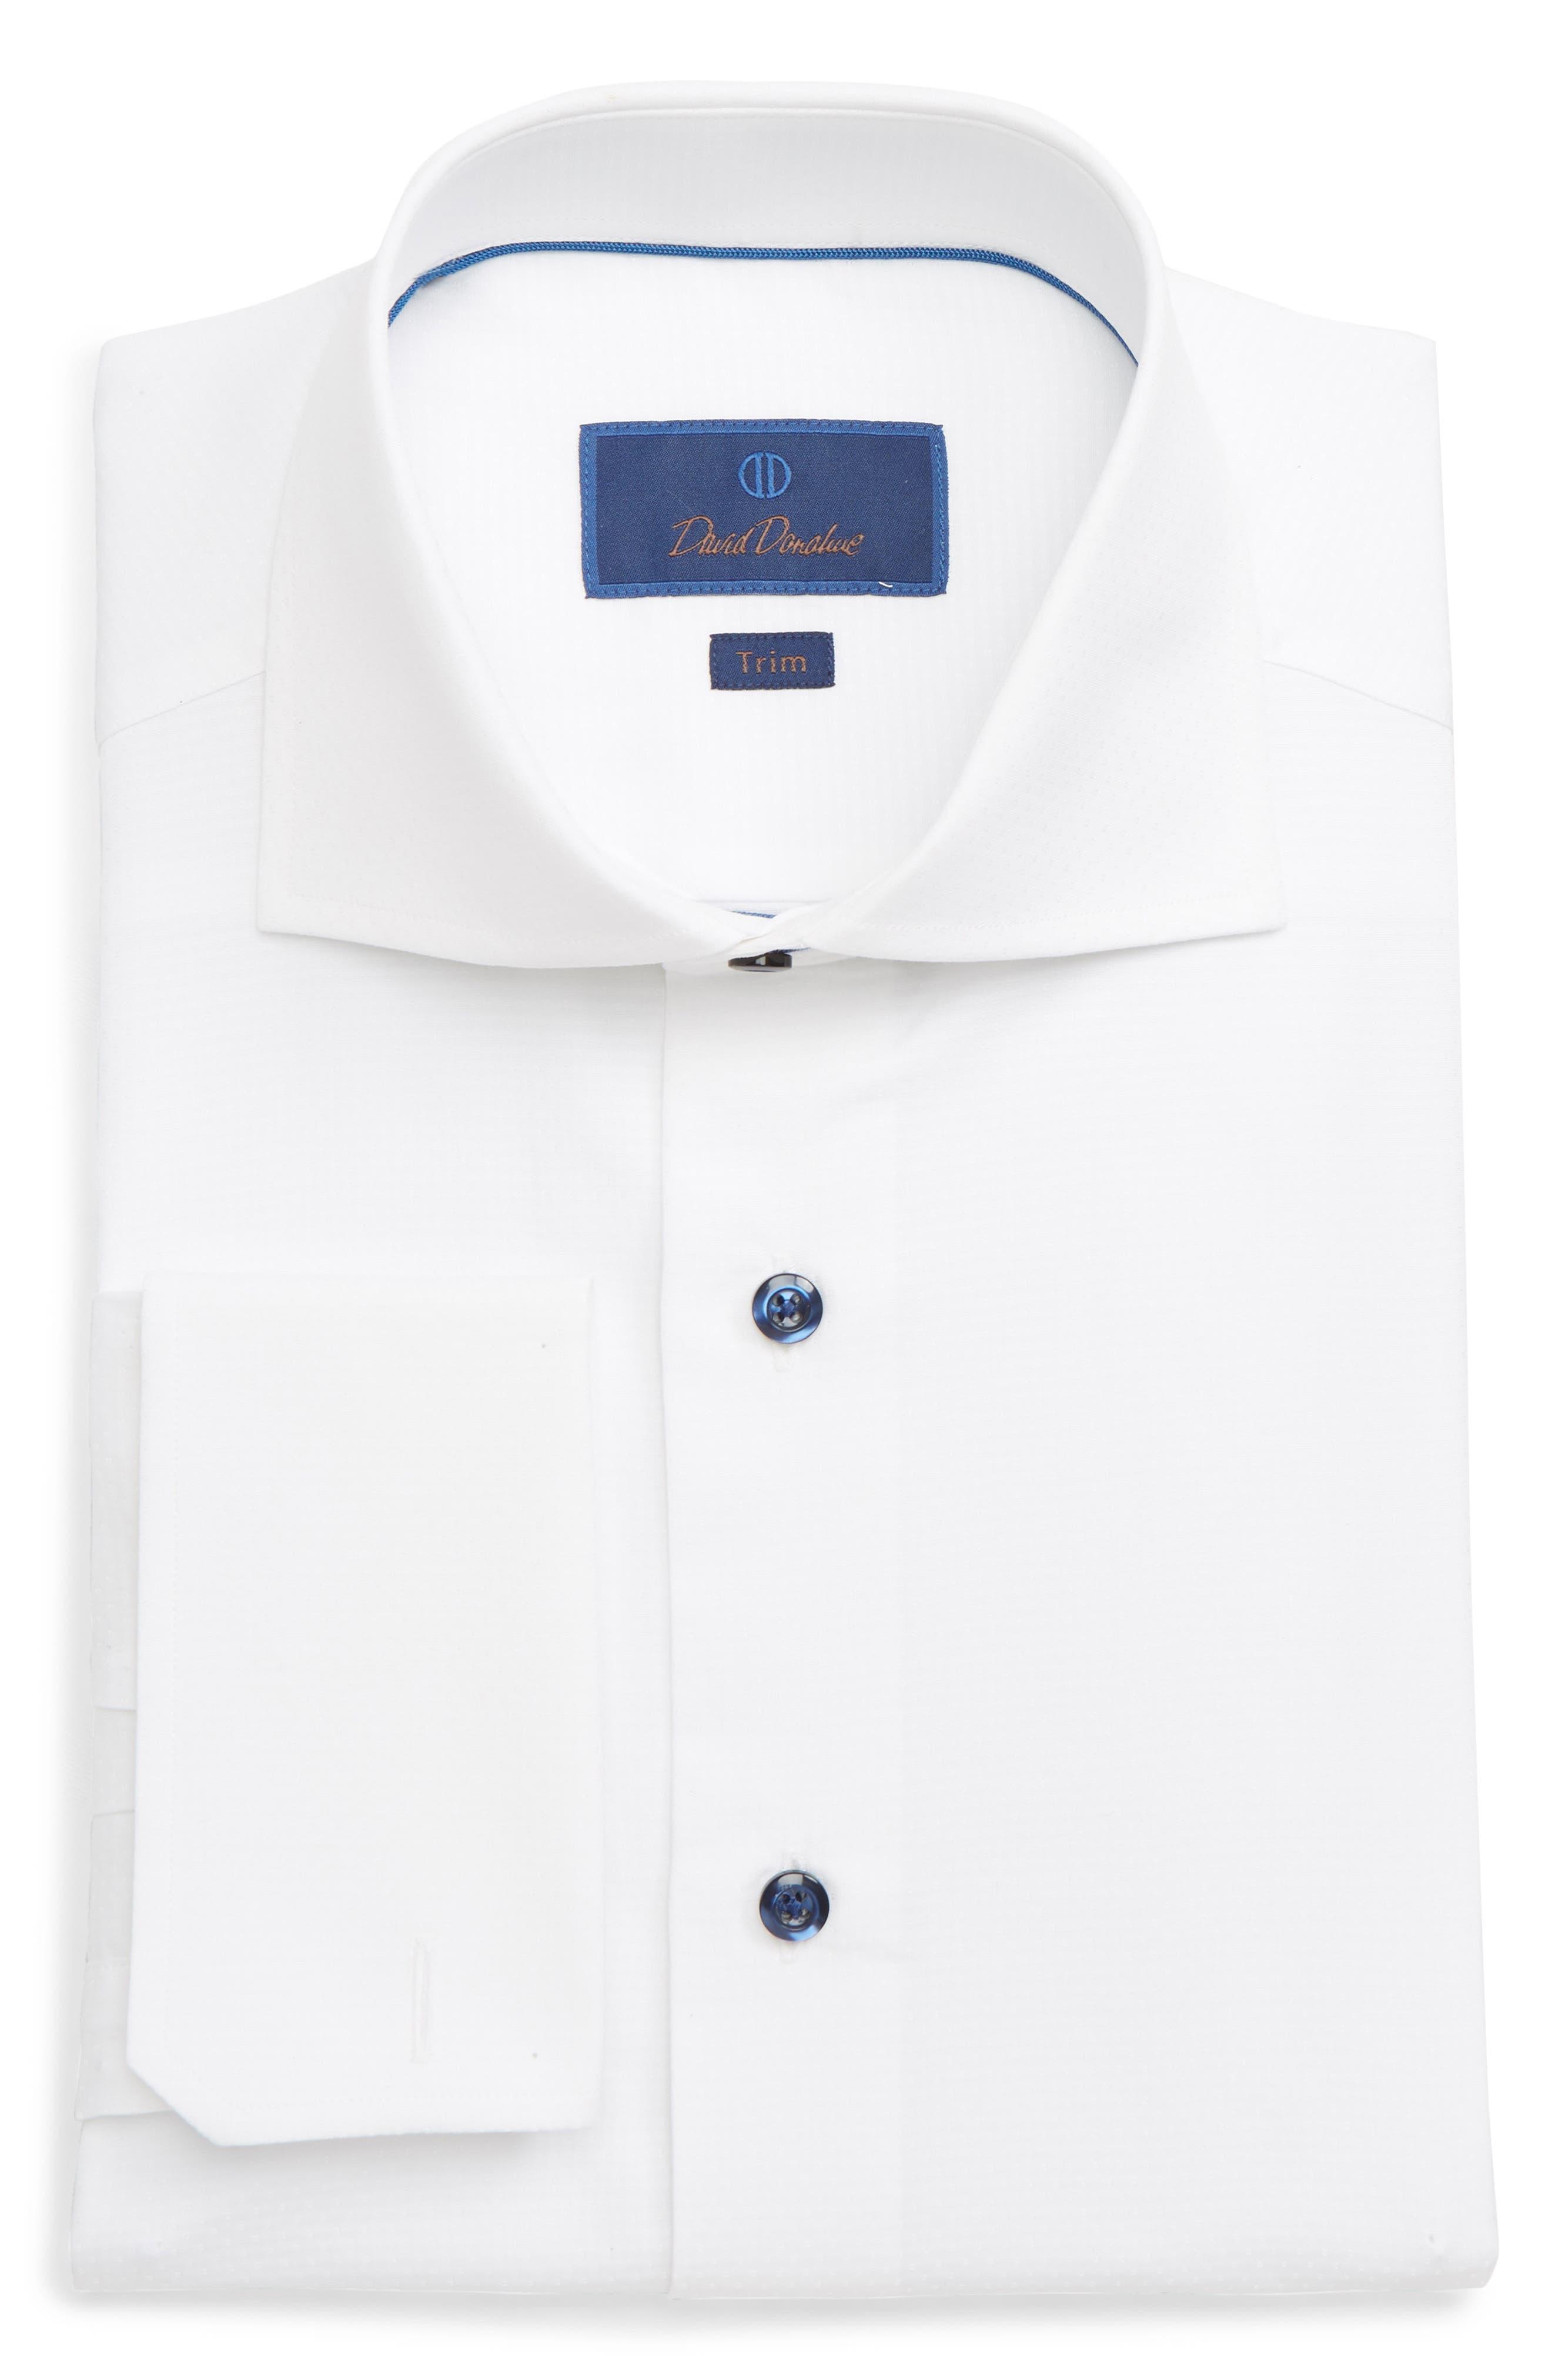 DAVID DONAHUE Men'S Trim-Fit Mini Diamond Dress Shirt With French Cuffs in White